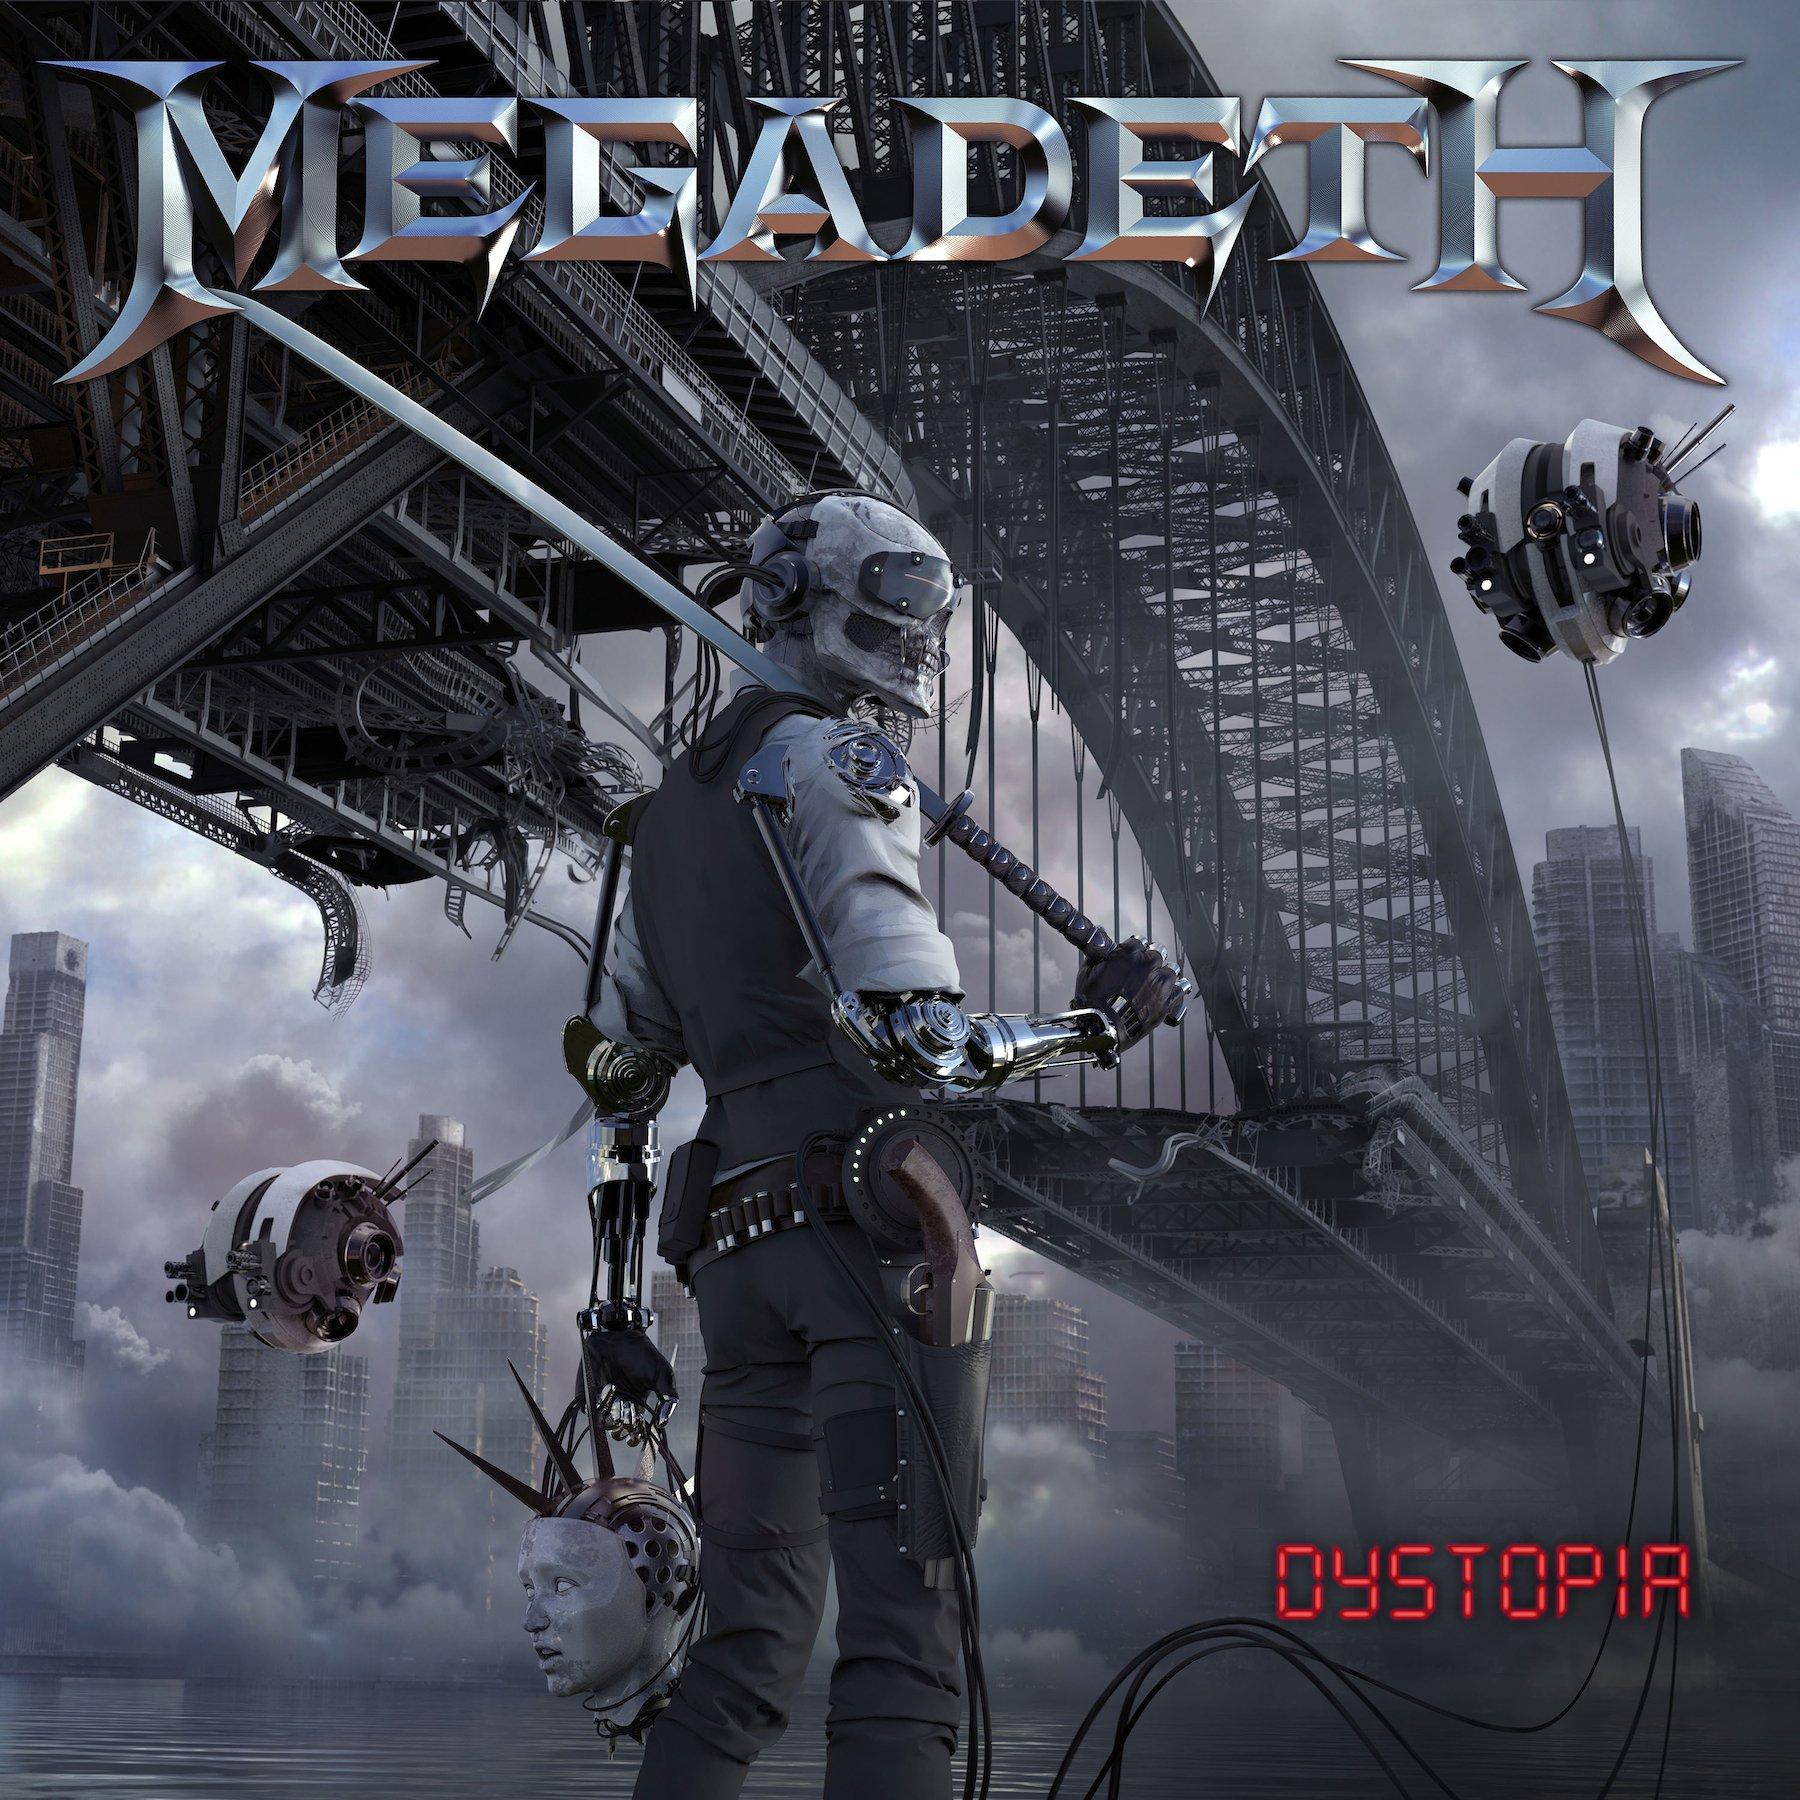 CD : Megadeth - Dystopia